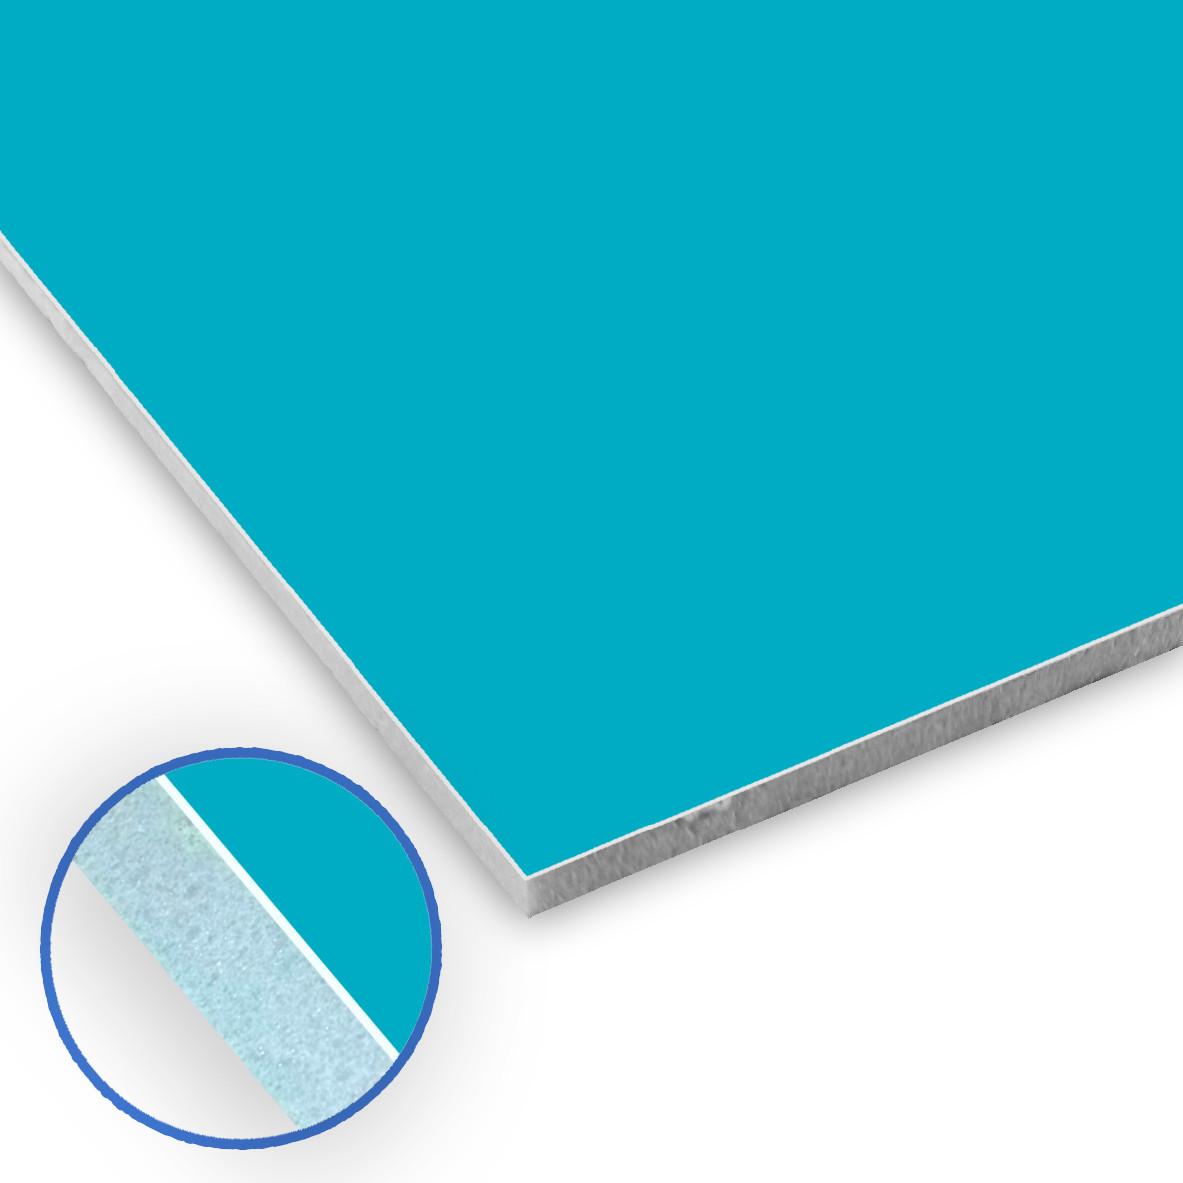 Откосная панель ПВХ 2000х3000мм односторонняя (ПВХ белый)